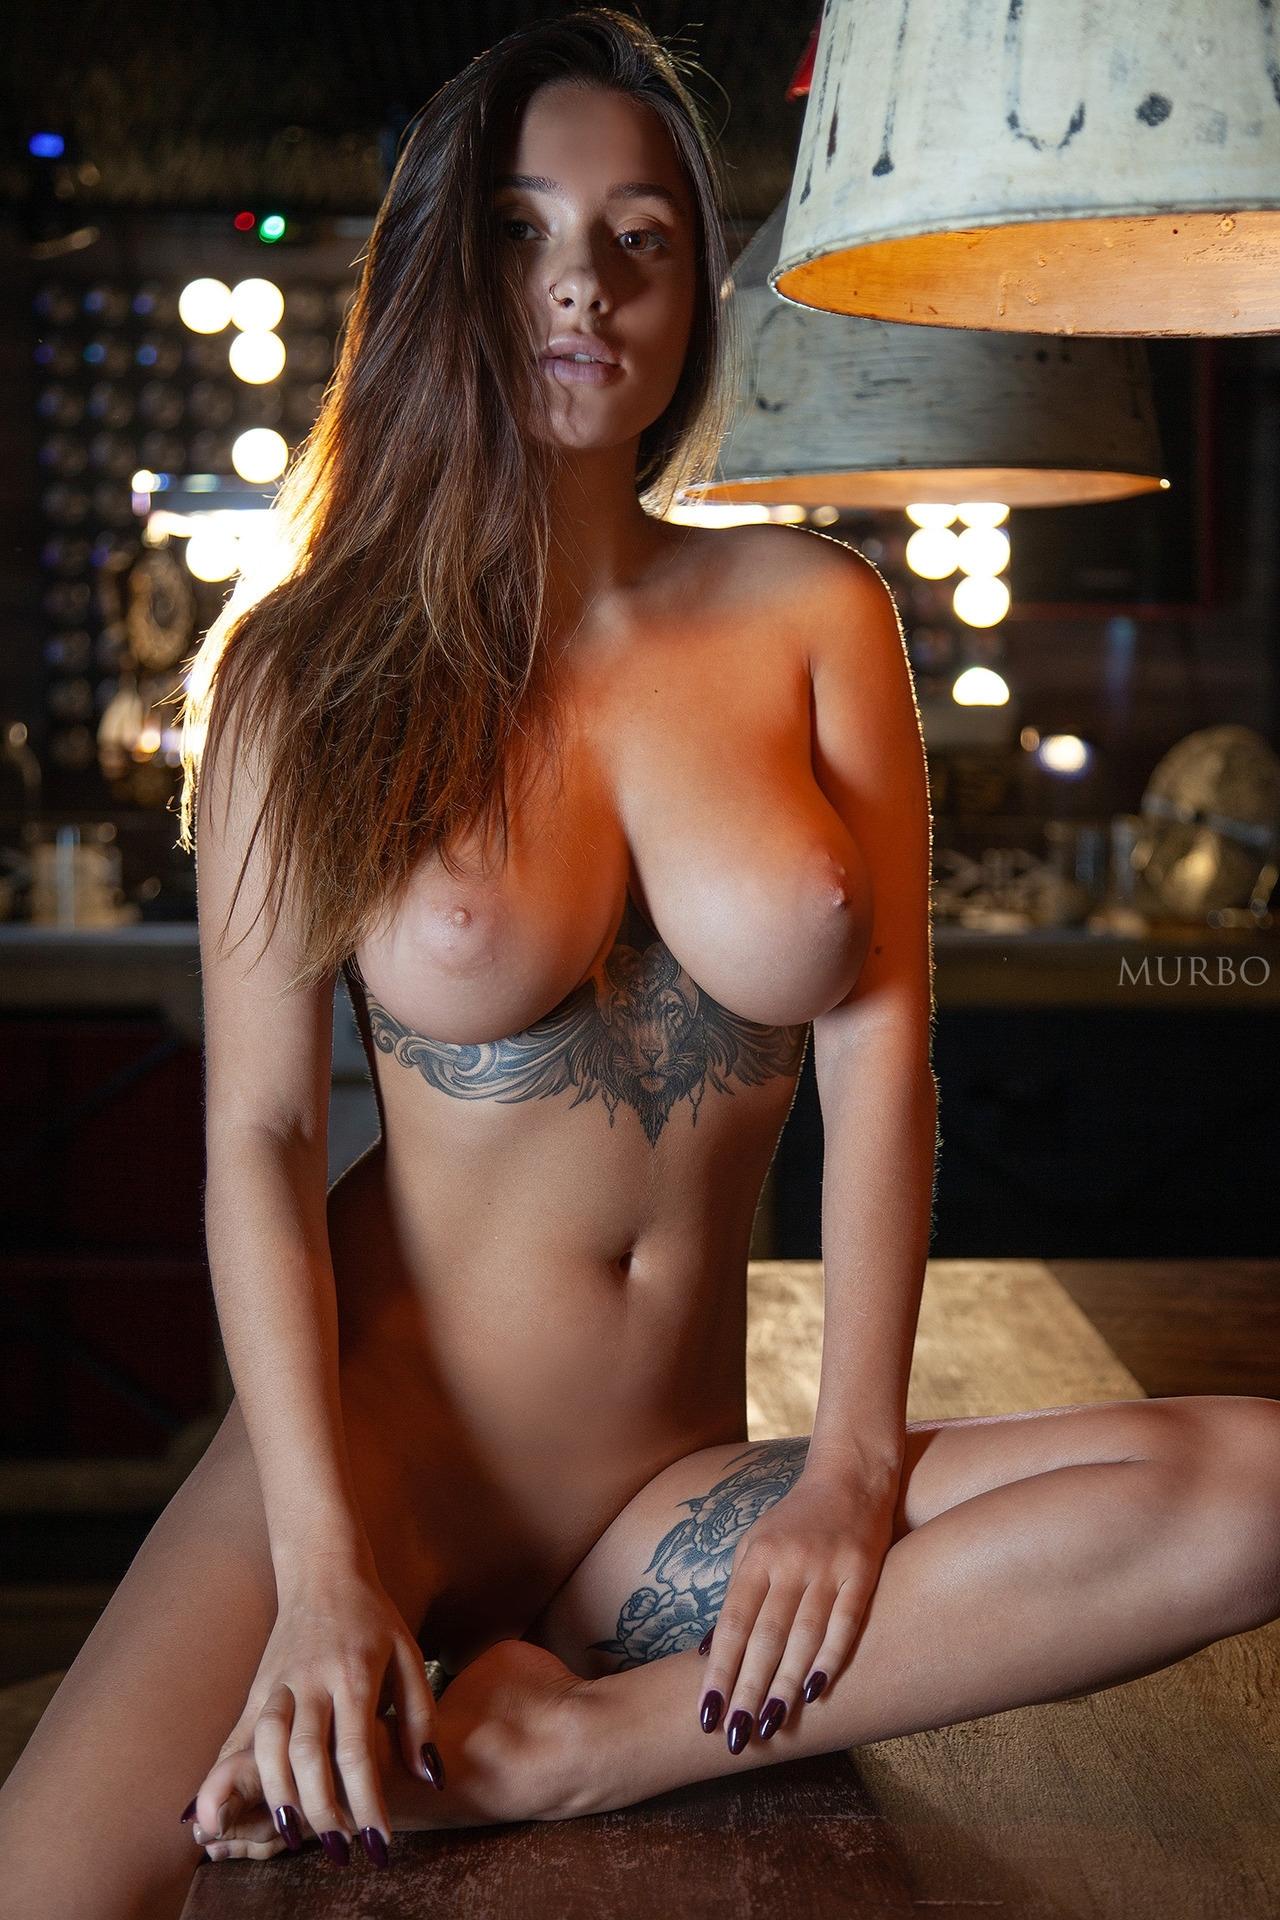 kristina-russkaya-porno-fotomodel